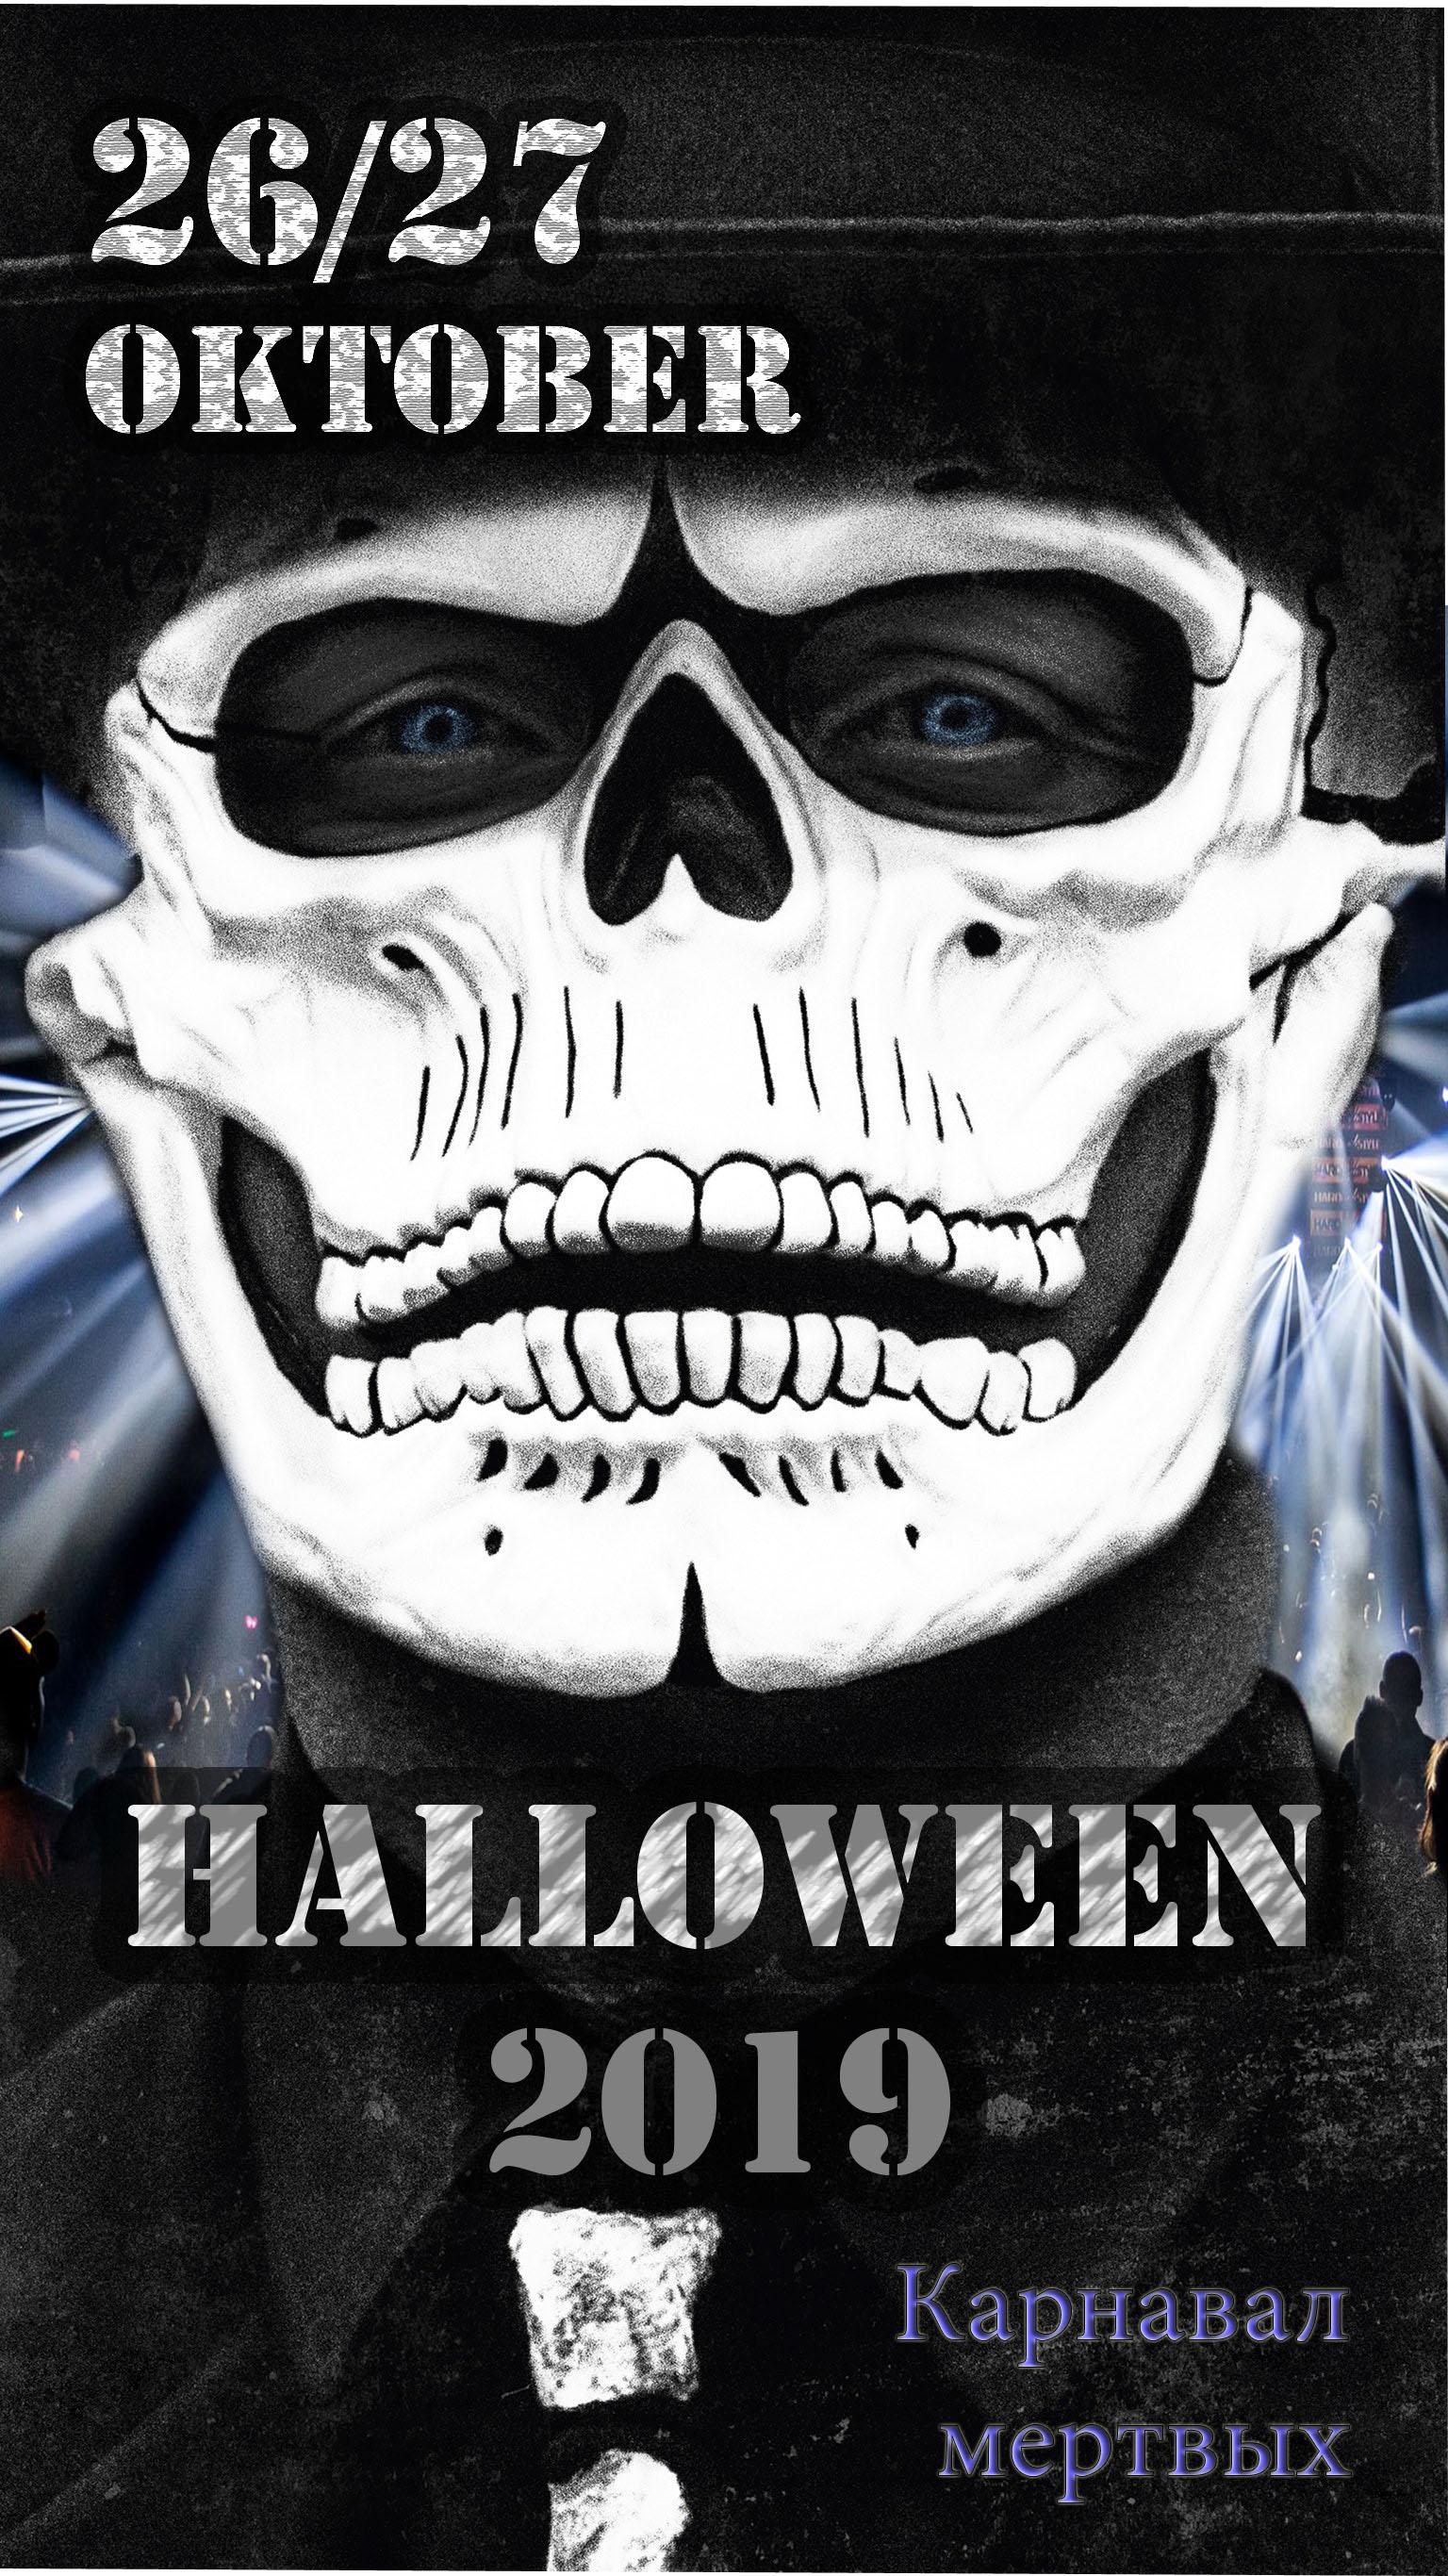 Дизайн афиши Хэллоуин 2019 для сети ночных клубов фото f_6475c6ee799852fe.jpg